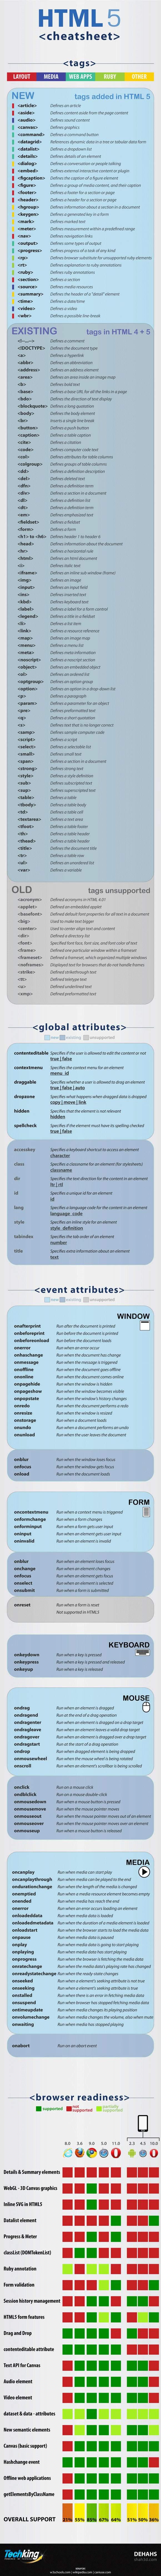 html5-cheat-sheet